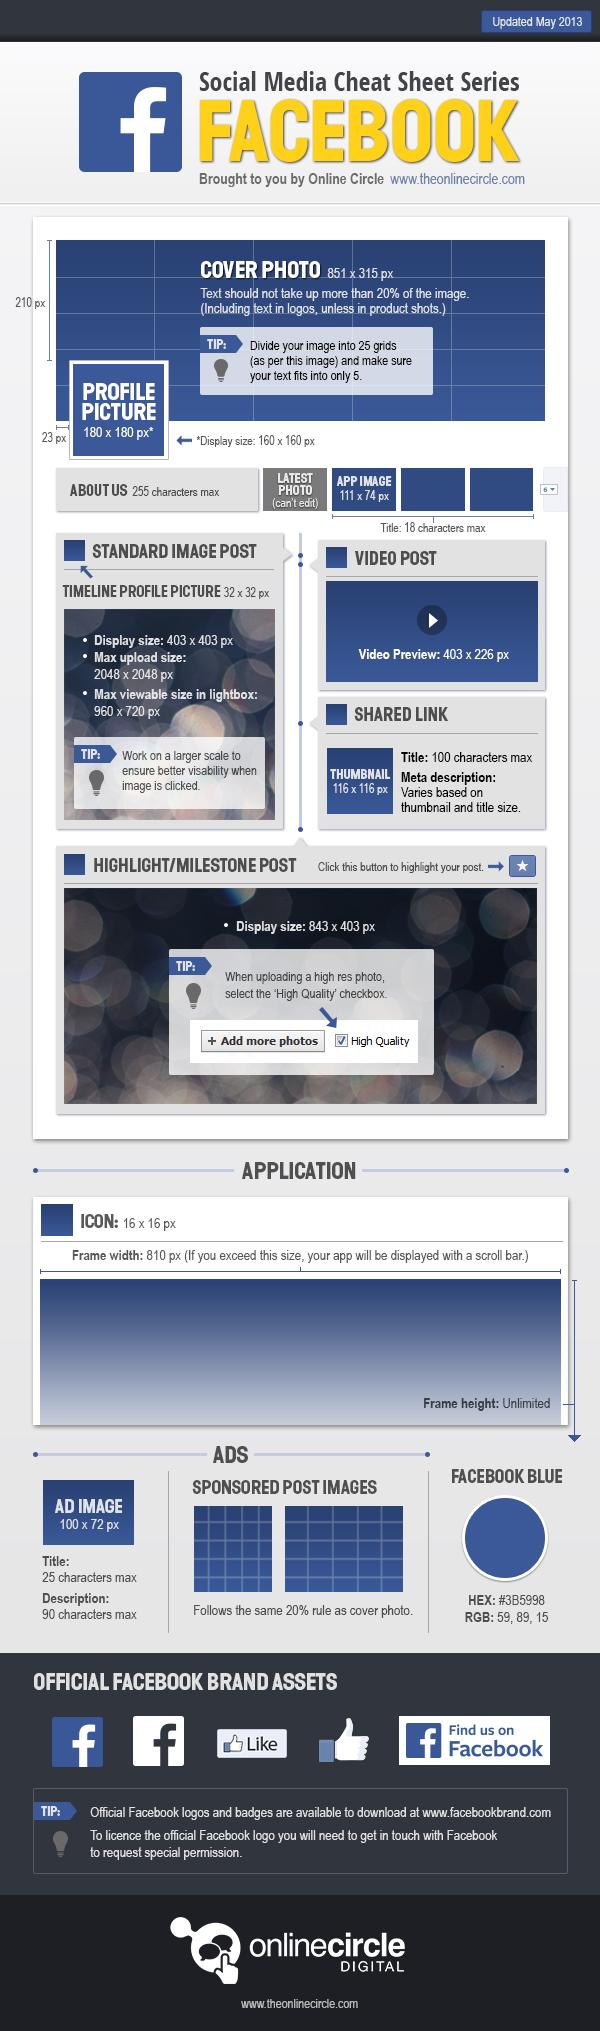 OnlineCircle.com Facebook Dimensions Cheat Sheet